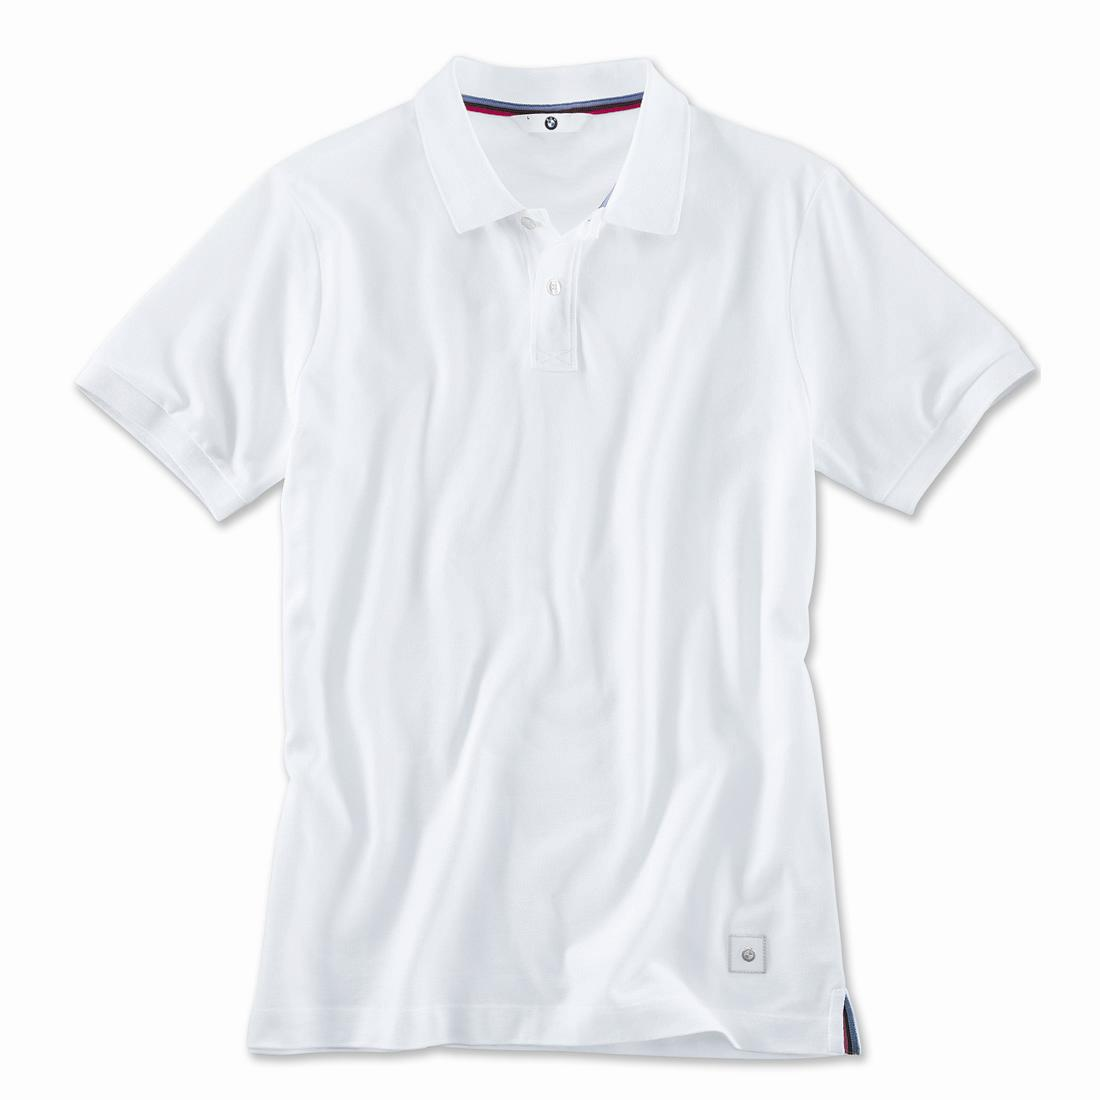 Bmw polo shirt men white for Man in polo shirt